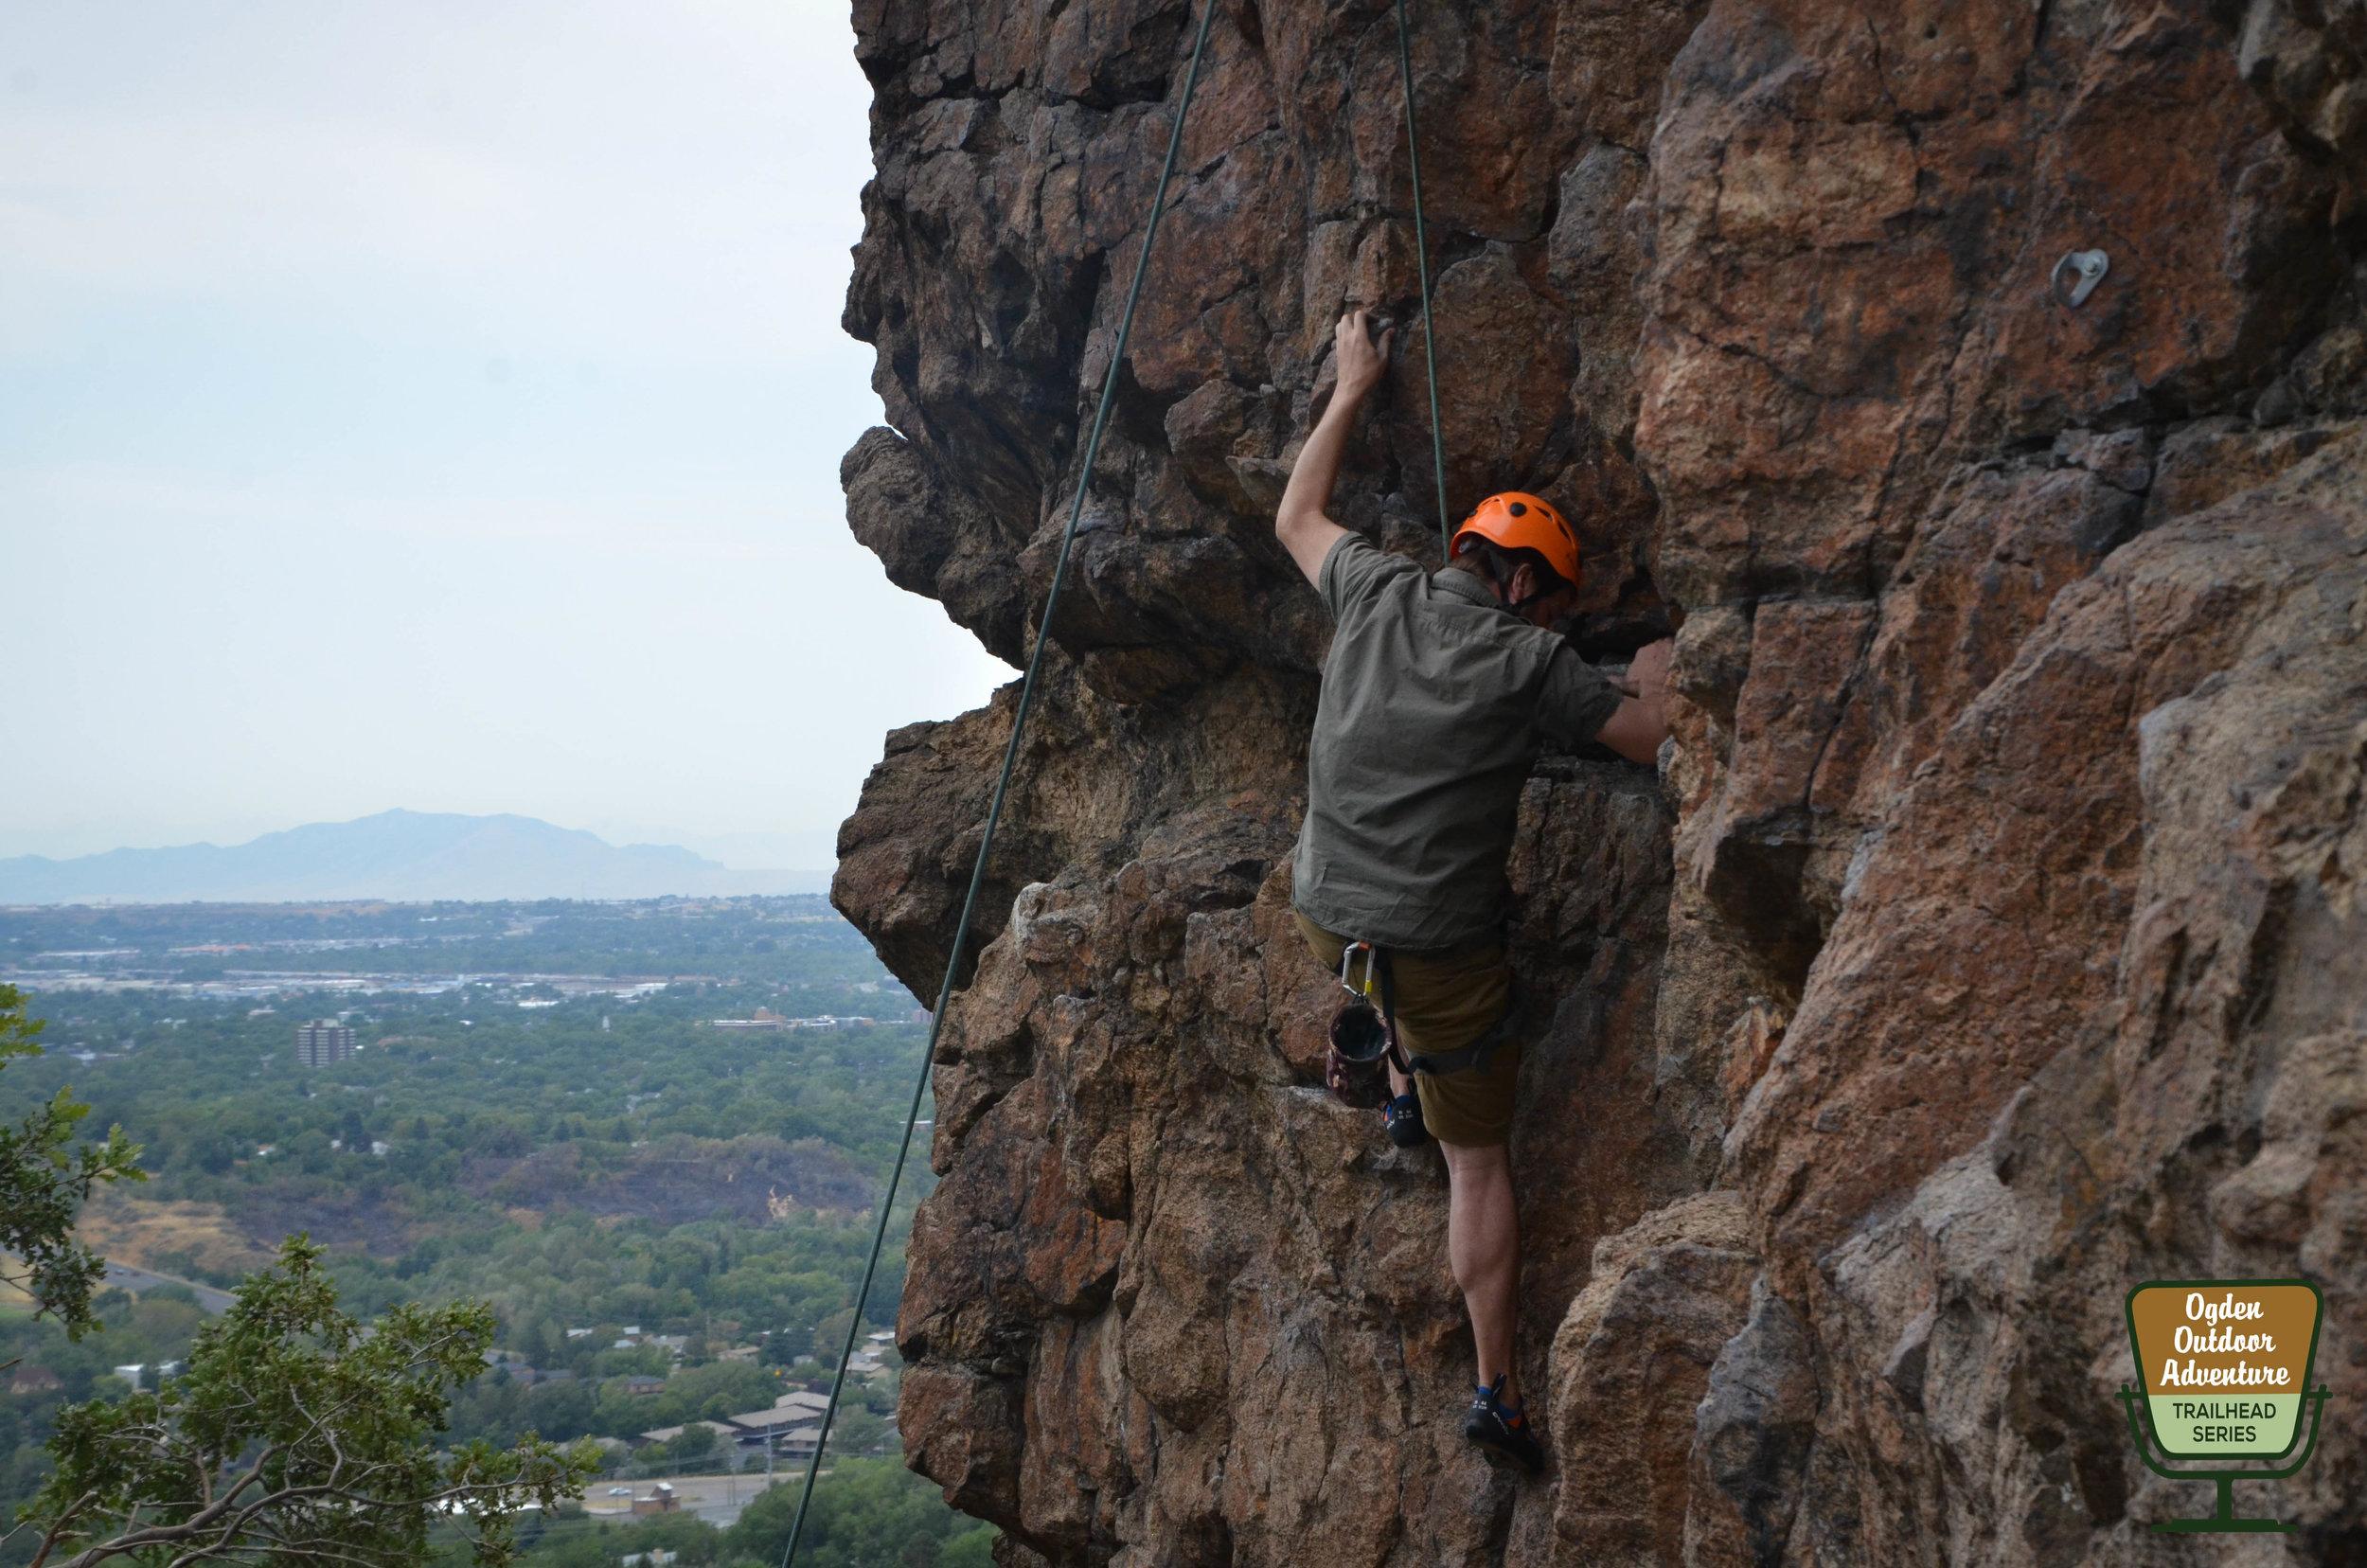 Ogden Outdoor Adventure Show 248 - Bear House Mountaineering-18.jpg